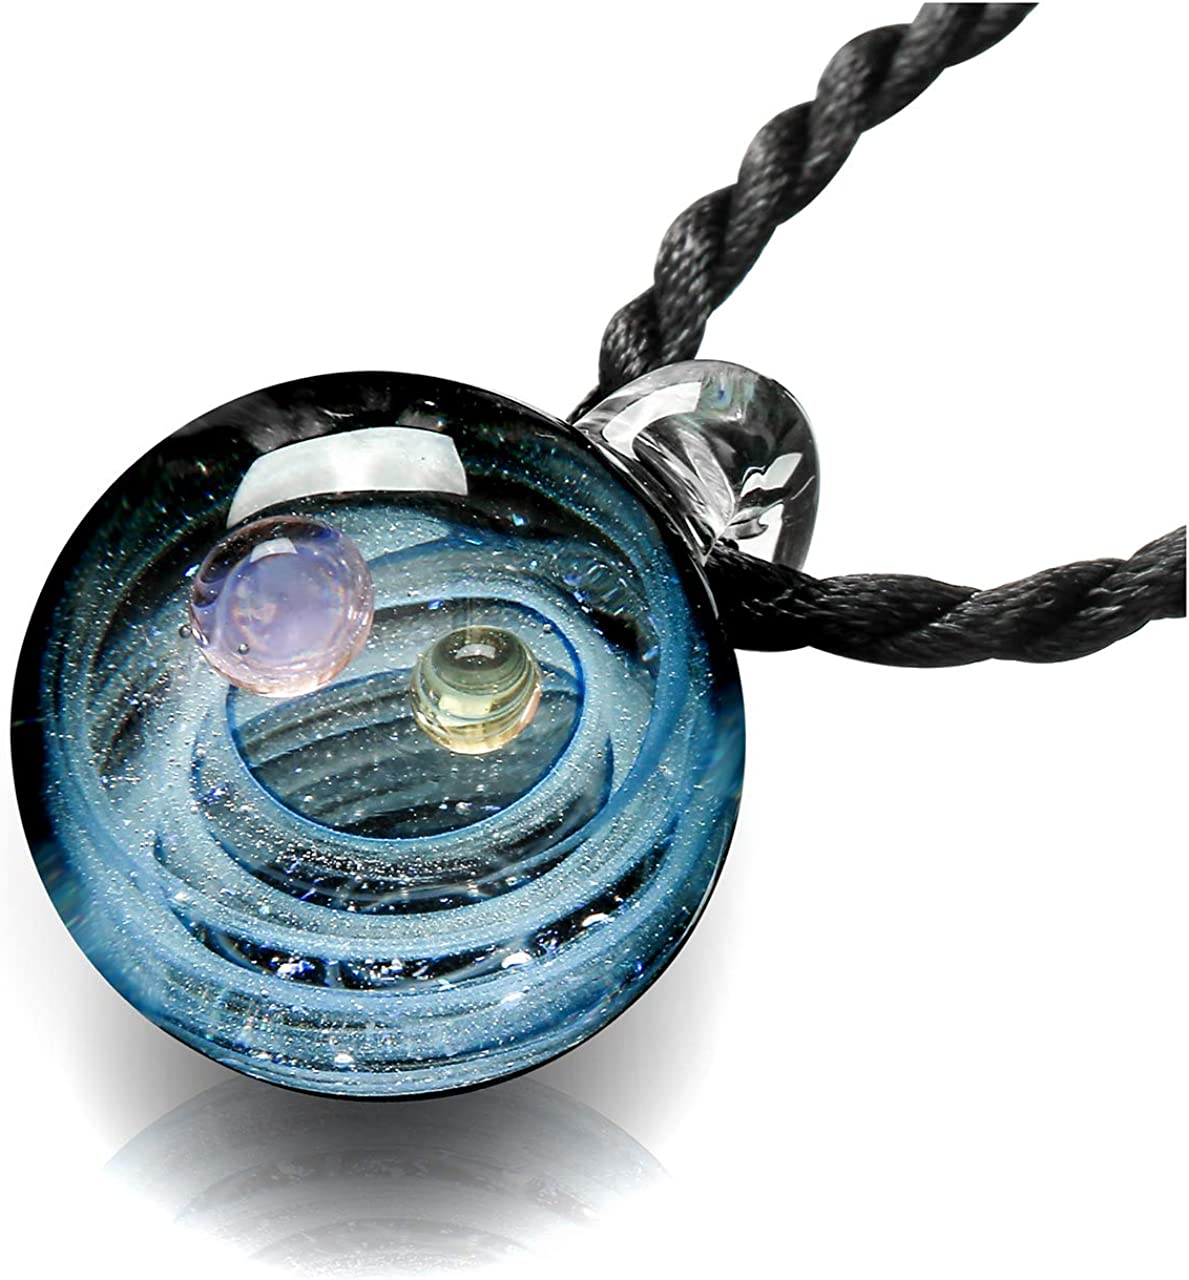 Jovivi joyería Collar de Mujer con Colgante nebuloso Galaxia Pianeta Universo de Vidrio, Dos Tipos de Cadena, Color Bello, Amigo niña Novia